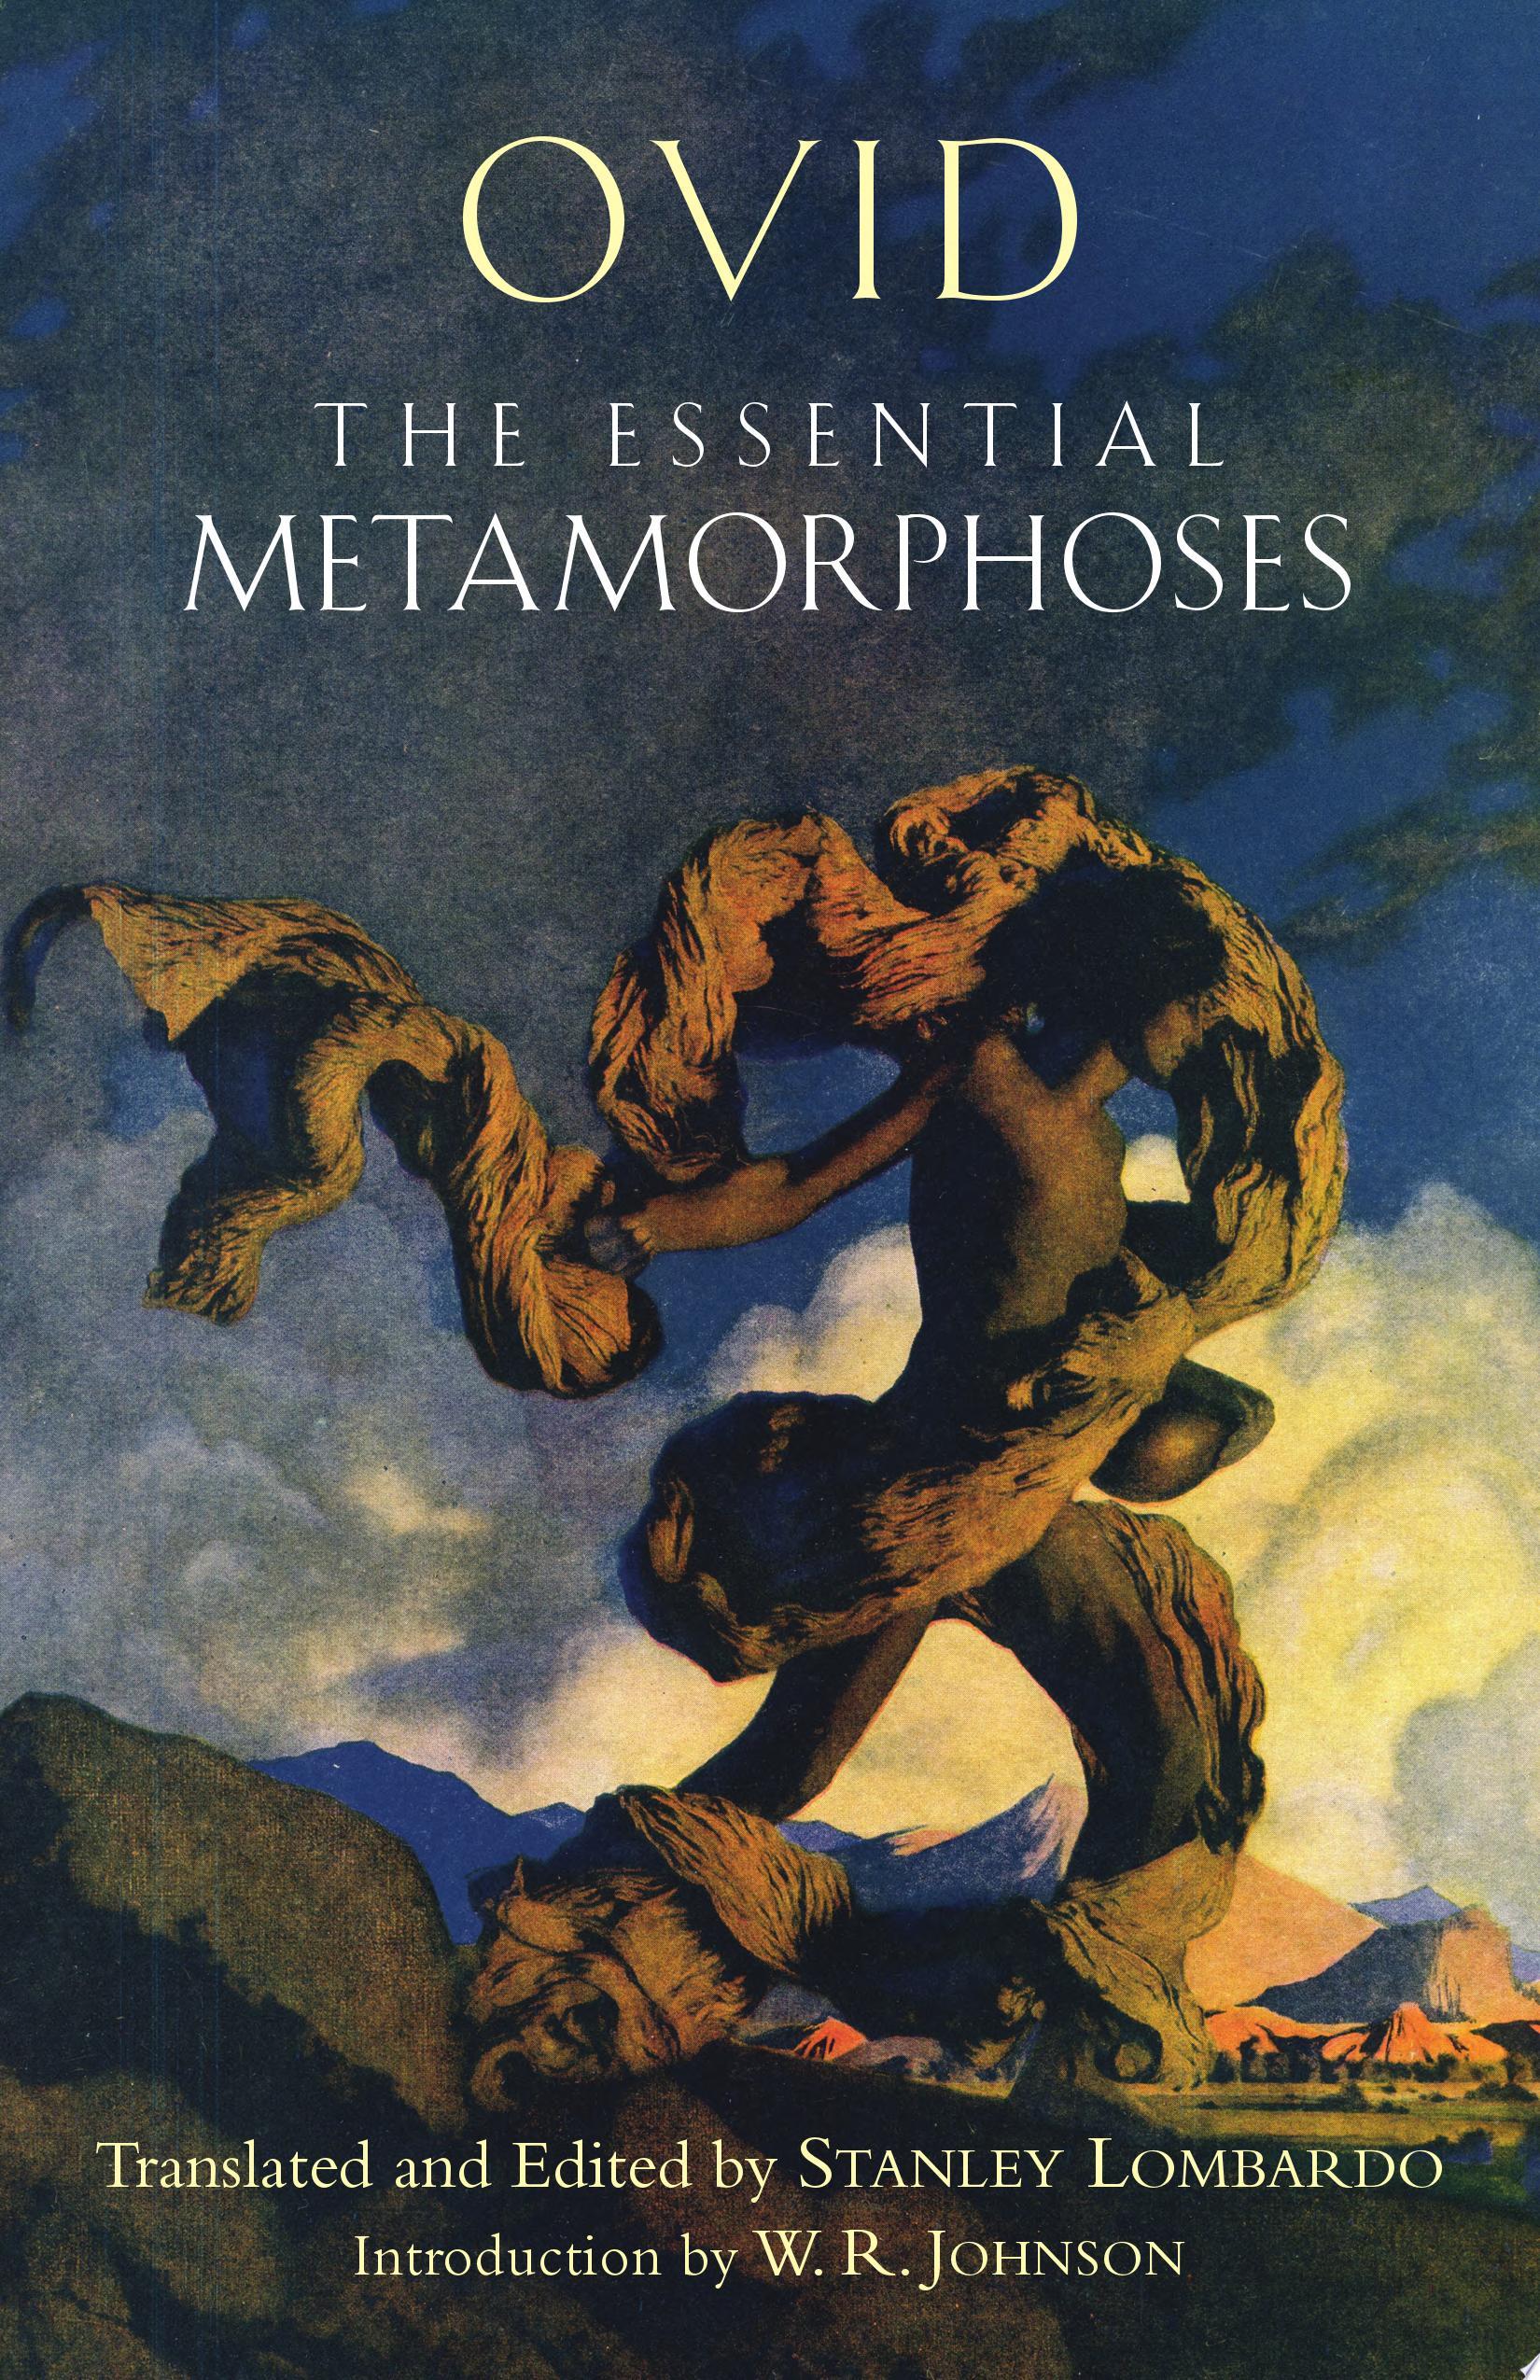 The Essential Metamorphoses